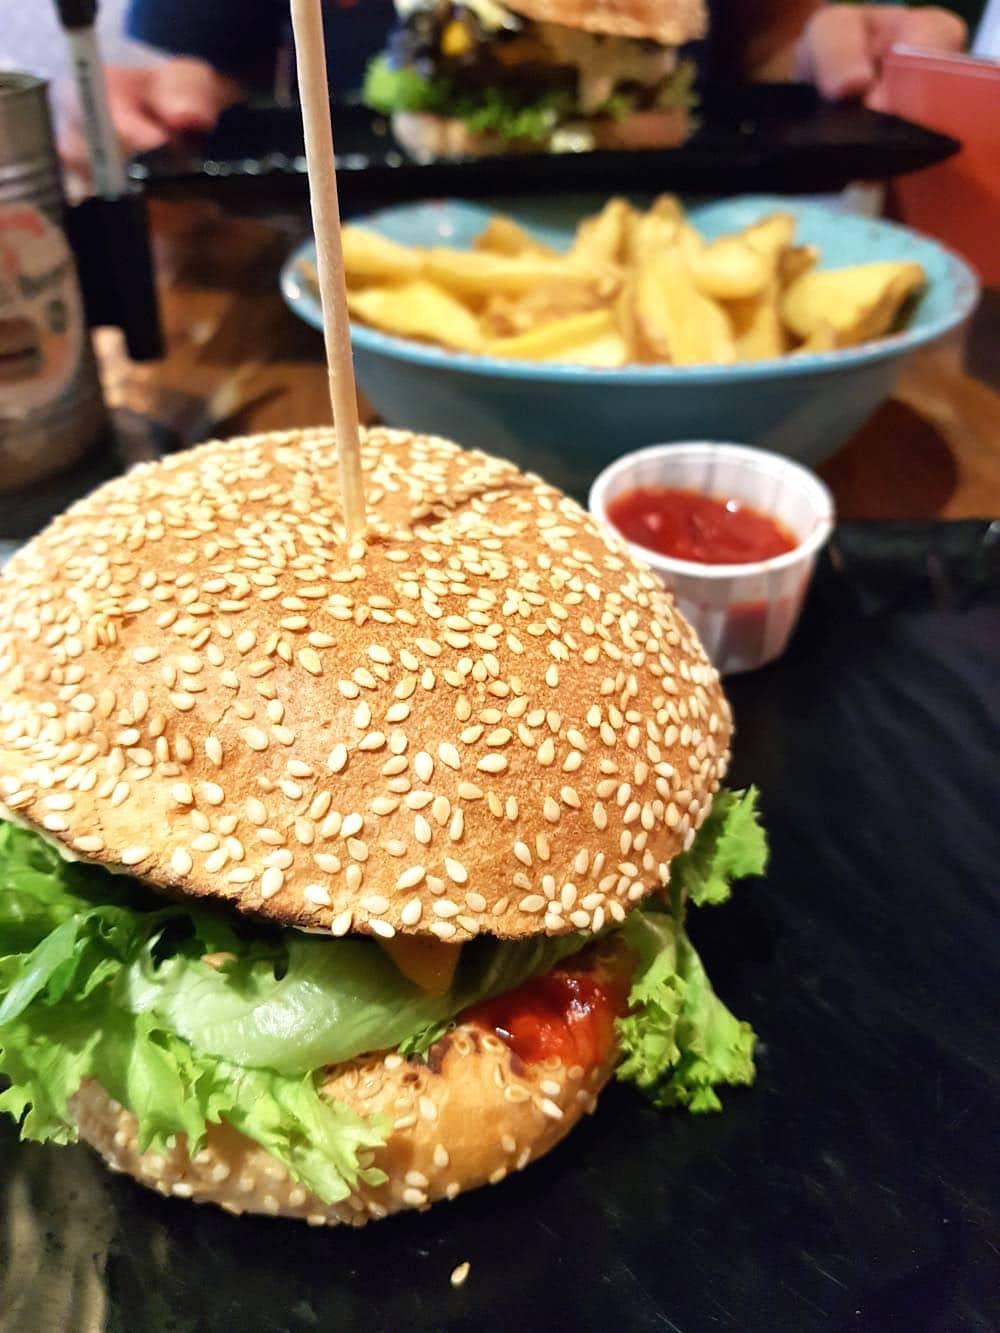 luebeck leos juice and burger roadtrip urlaub 4 - Roadtrip durch Ostdeutschland - Infos & Tipps